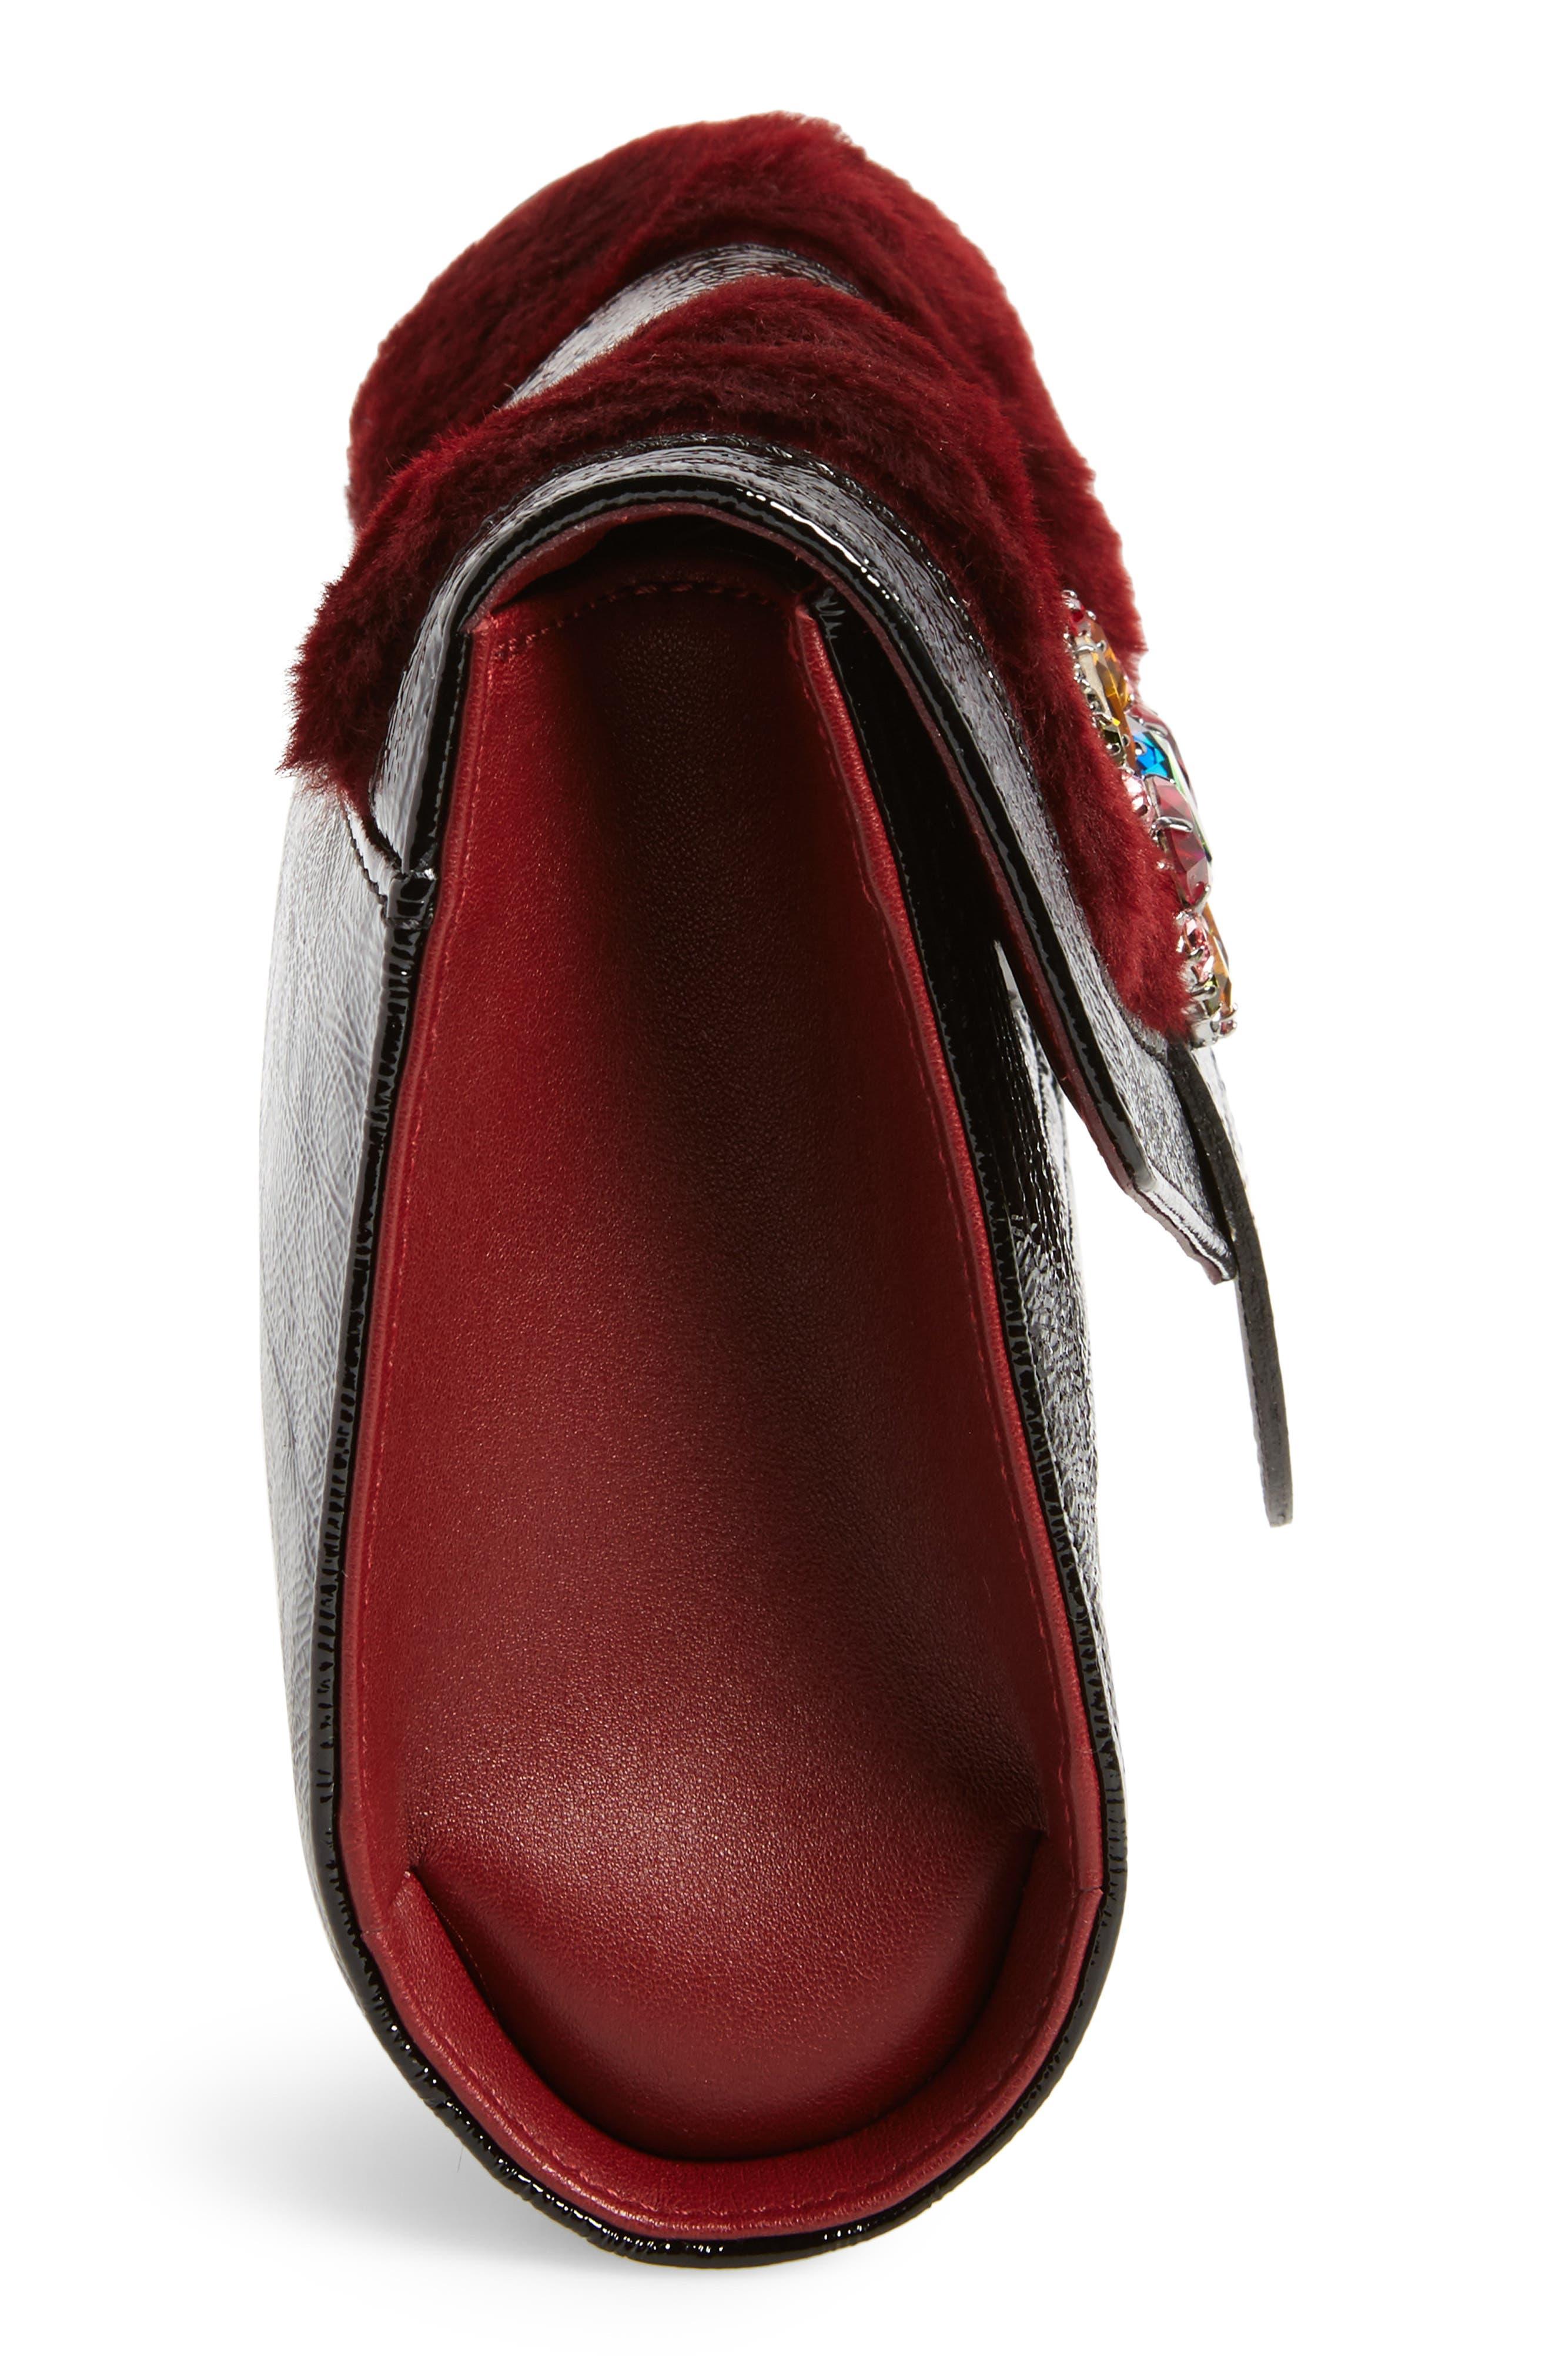 La Baronne Genuine Shearling Trim Leather Clutch,                             Alternate thumbnail 5, color,